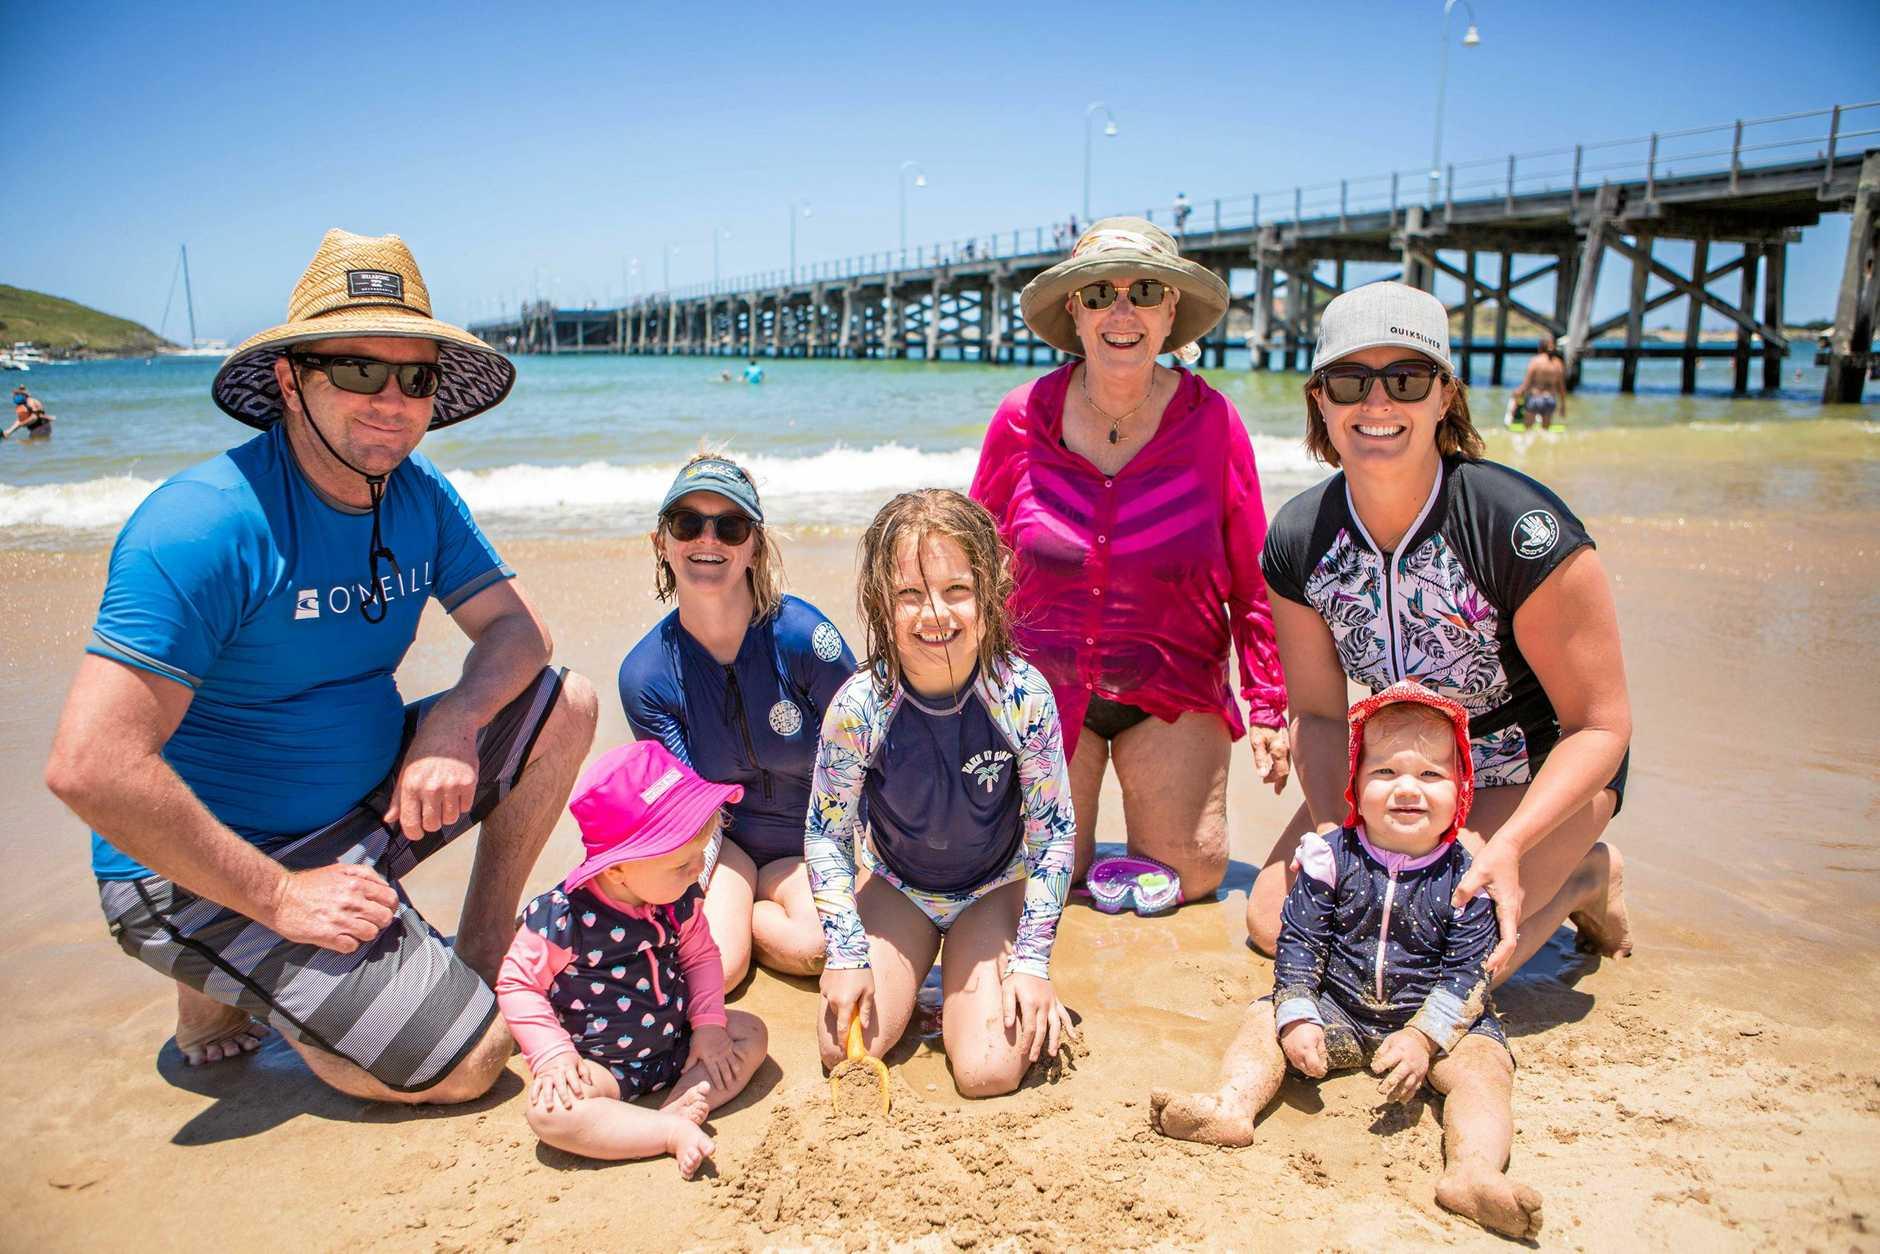 Robert, Abigail, Alison, Charlotte, Carol, Poppy and Debbie enjoying a break at Jetty Beach.